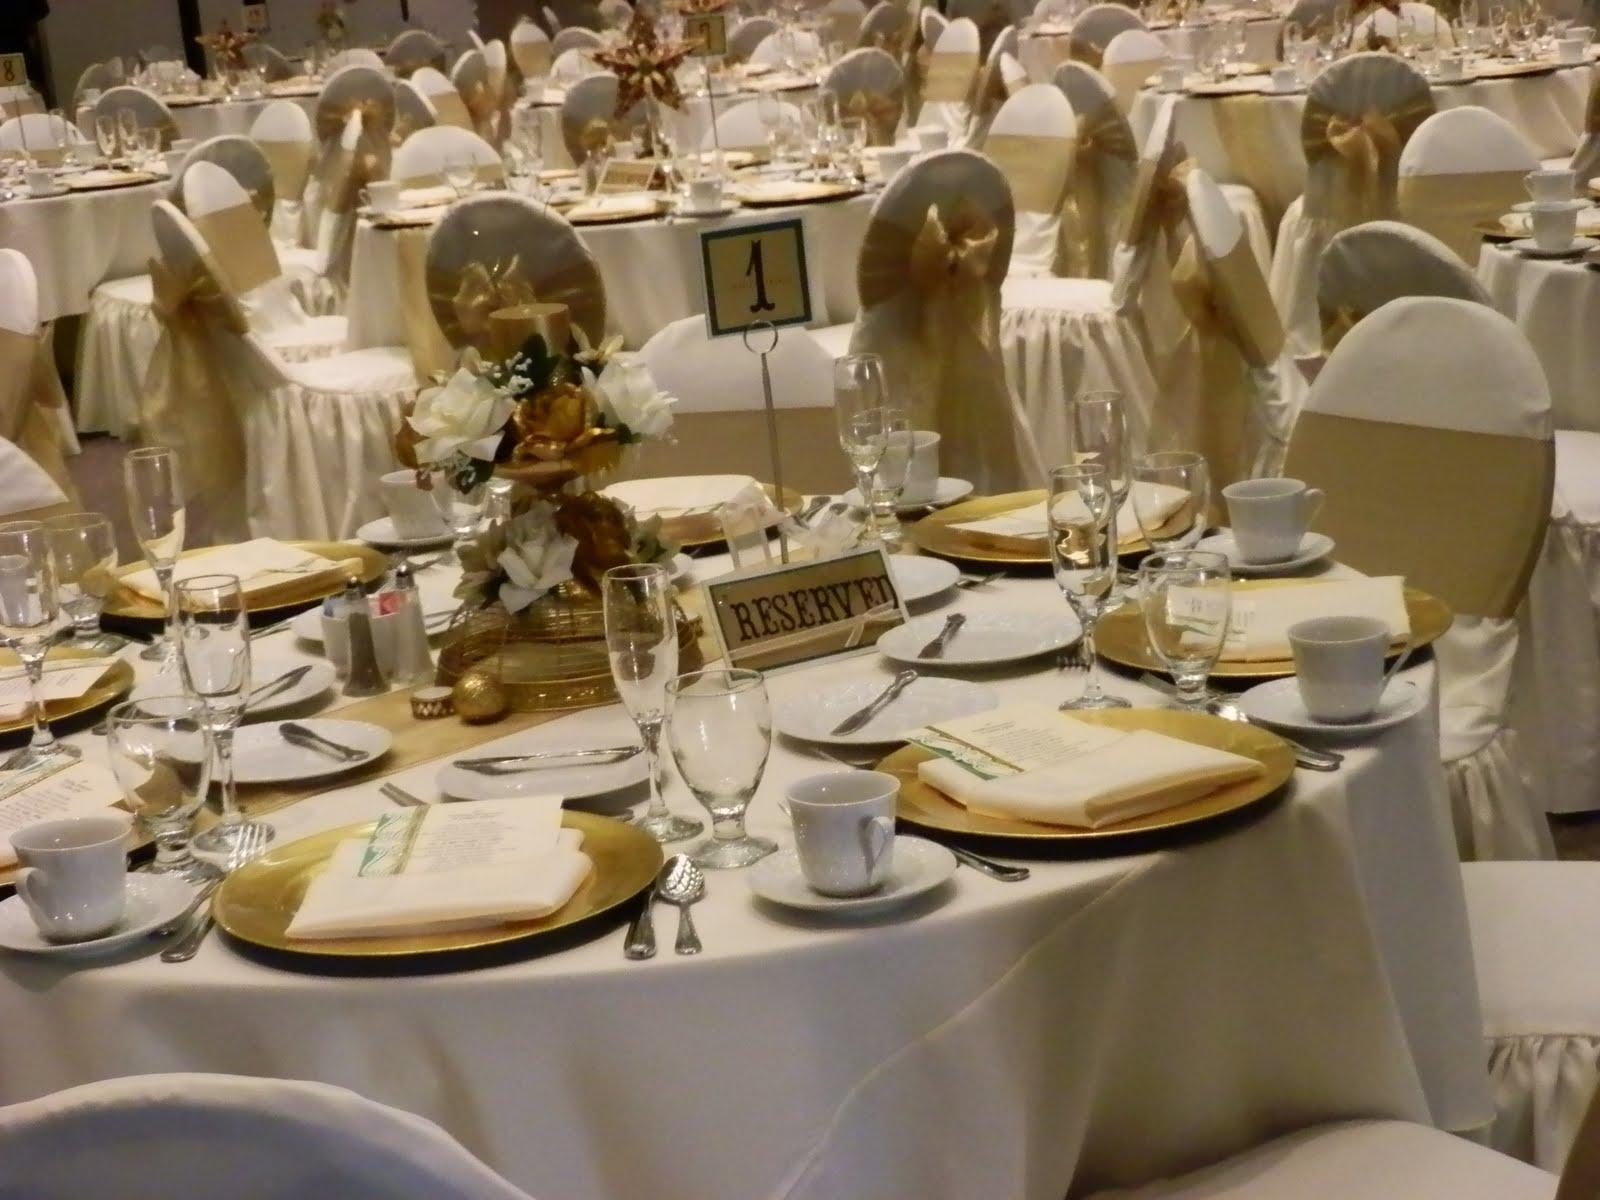 sbd events the event specialist. Black Bedroom Furniture Sets. Home Design Ideas